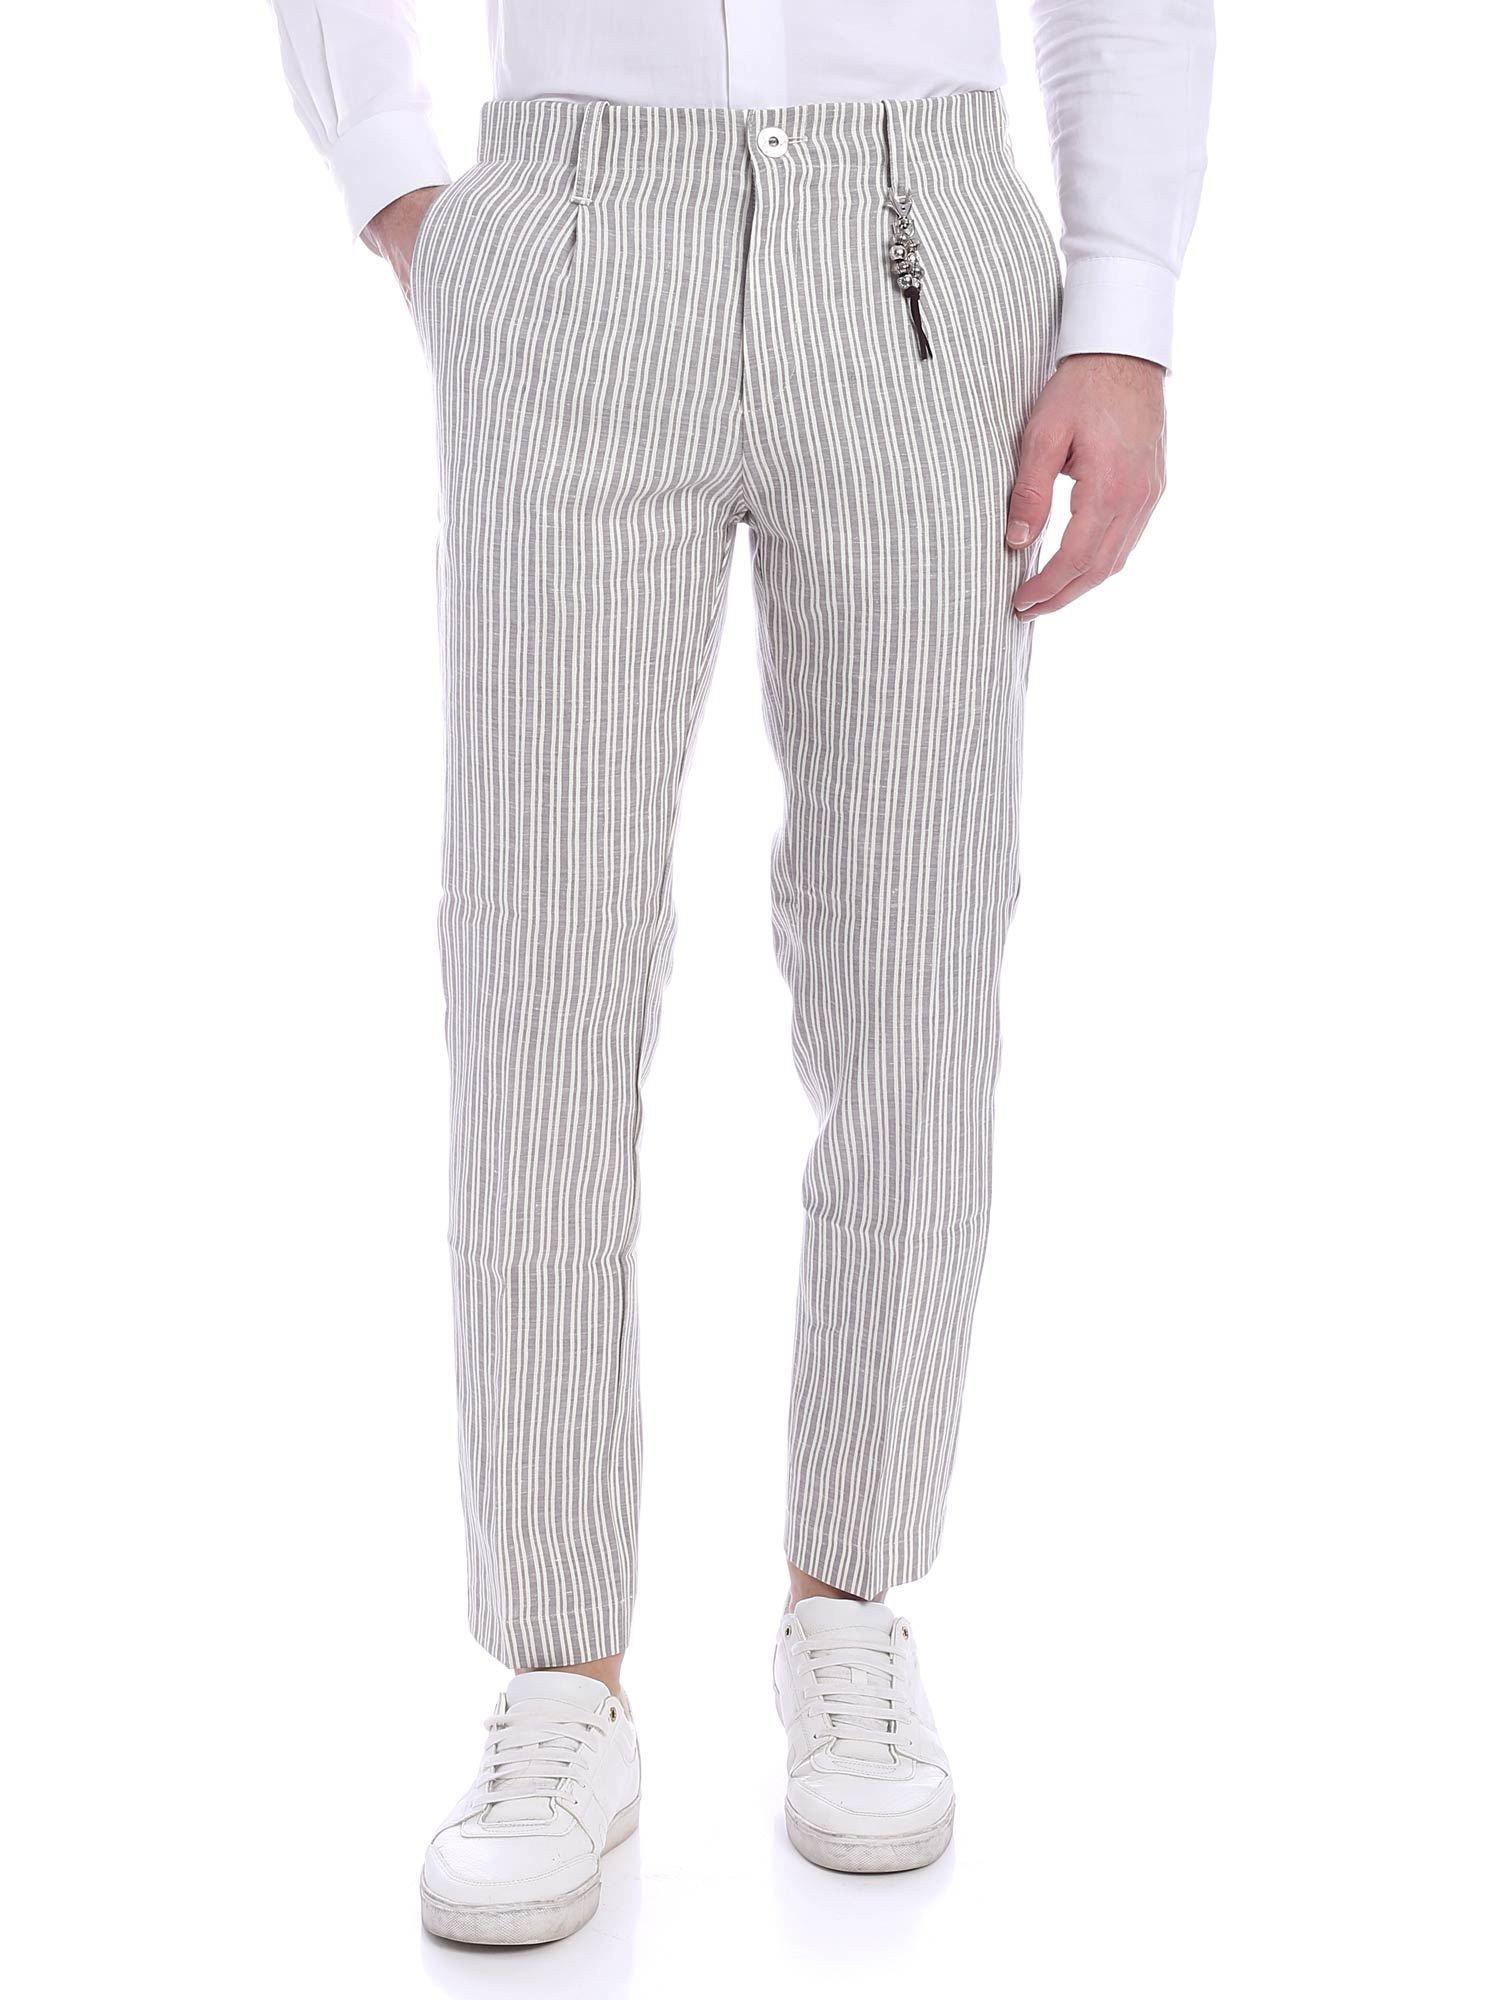 Image of Pantalone lino righe R92 L-RI